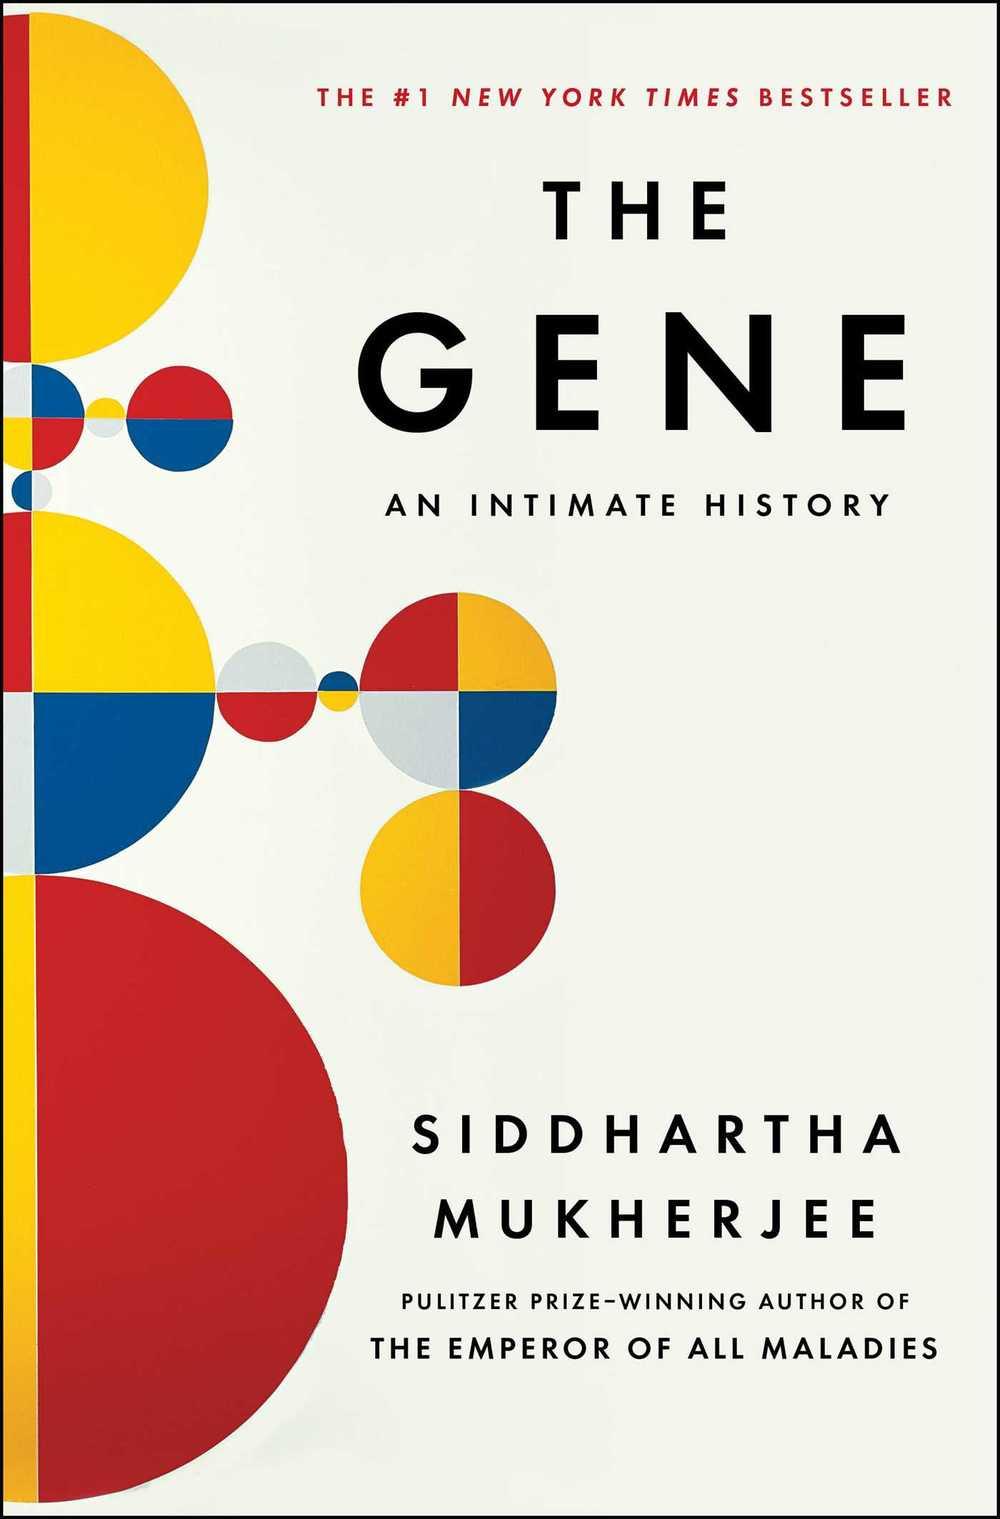 The Gene by Siddhartha Mukherjee (US Edition)